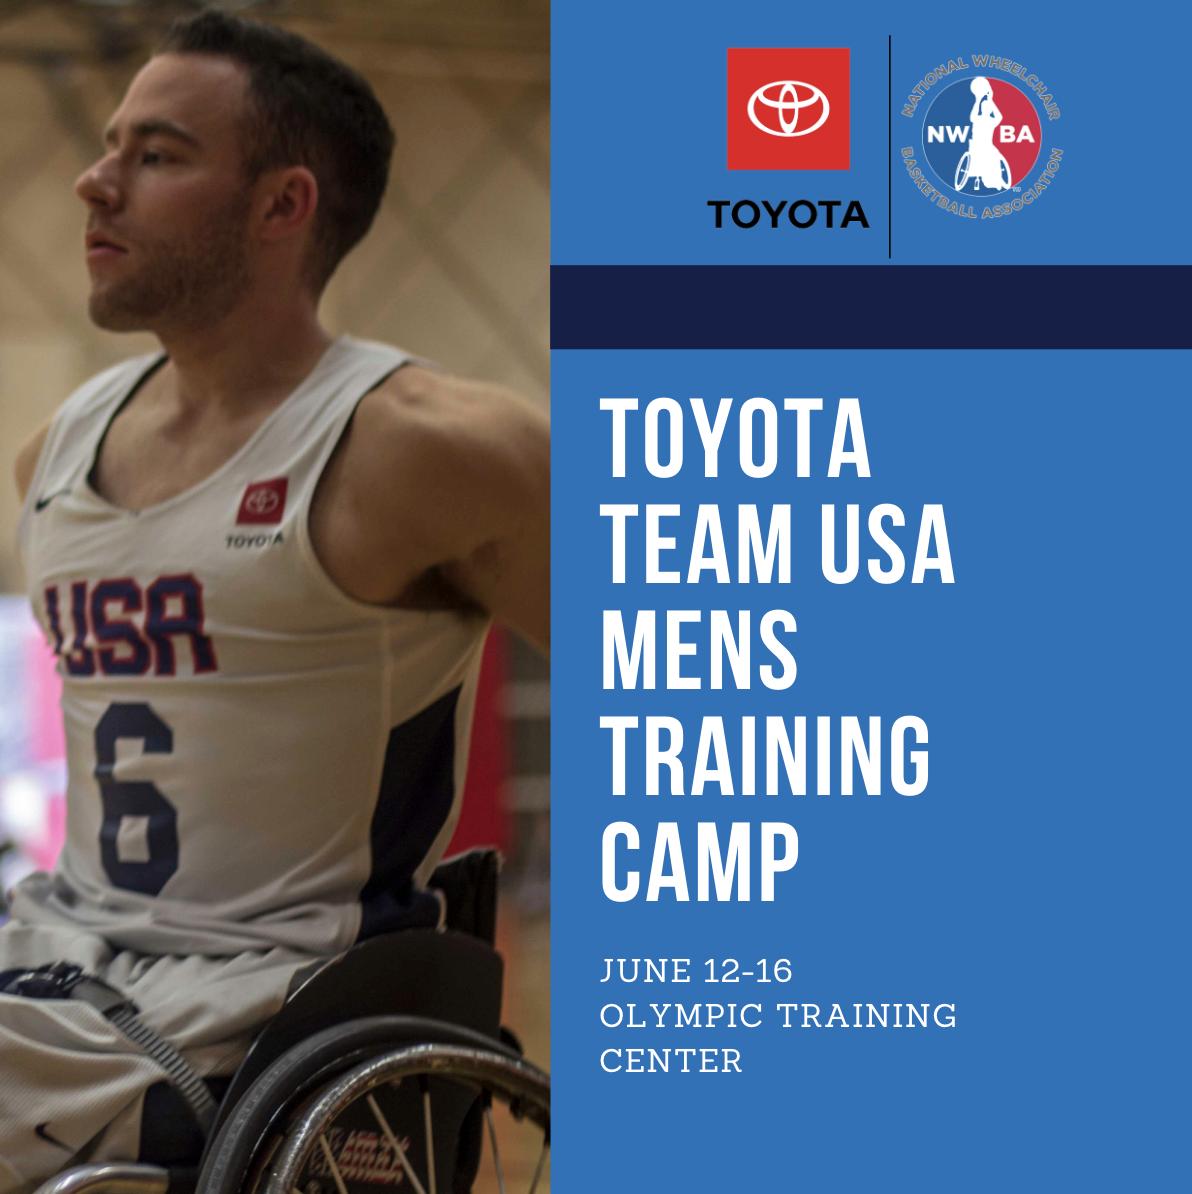 a676b28eb59 Toyota Team USA Men's Training Camp kicks off